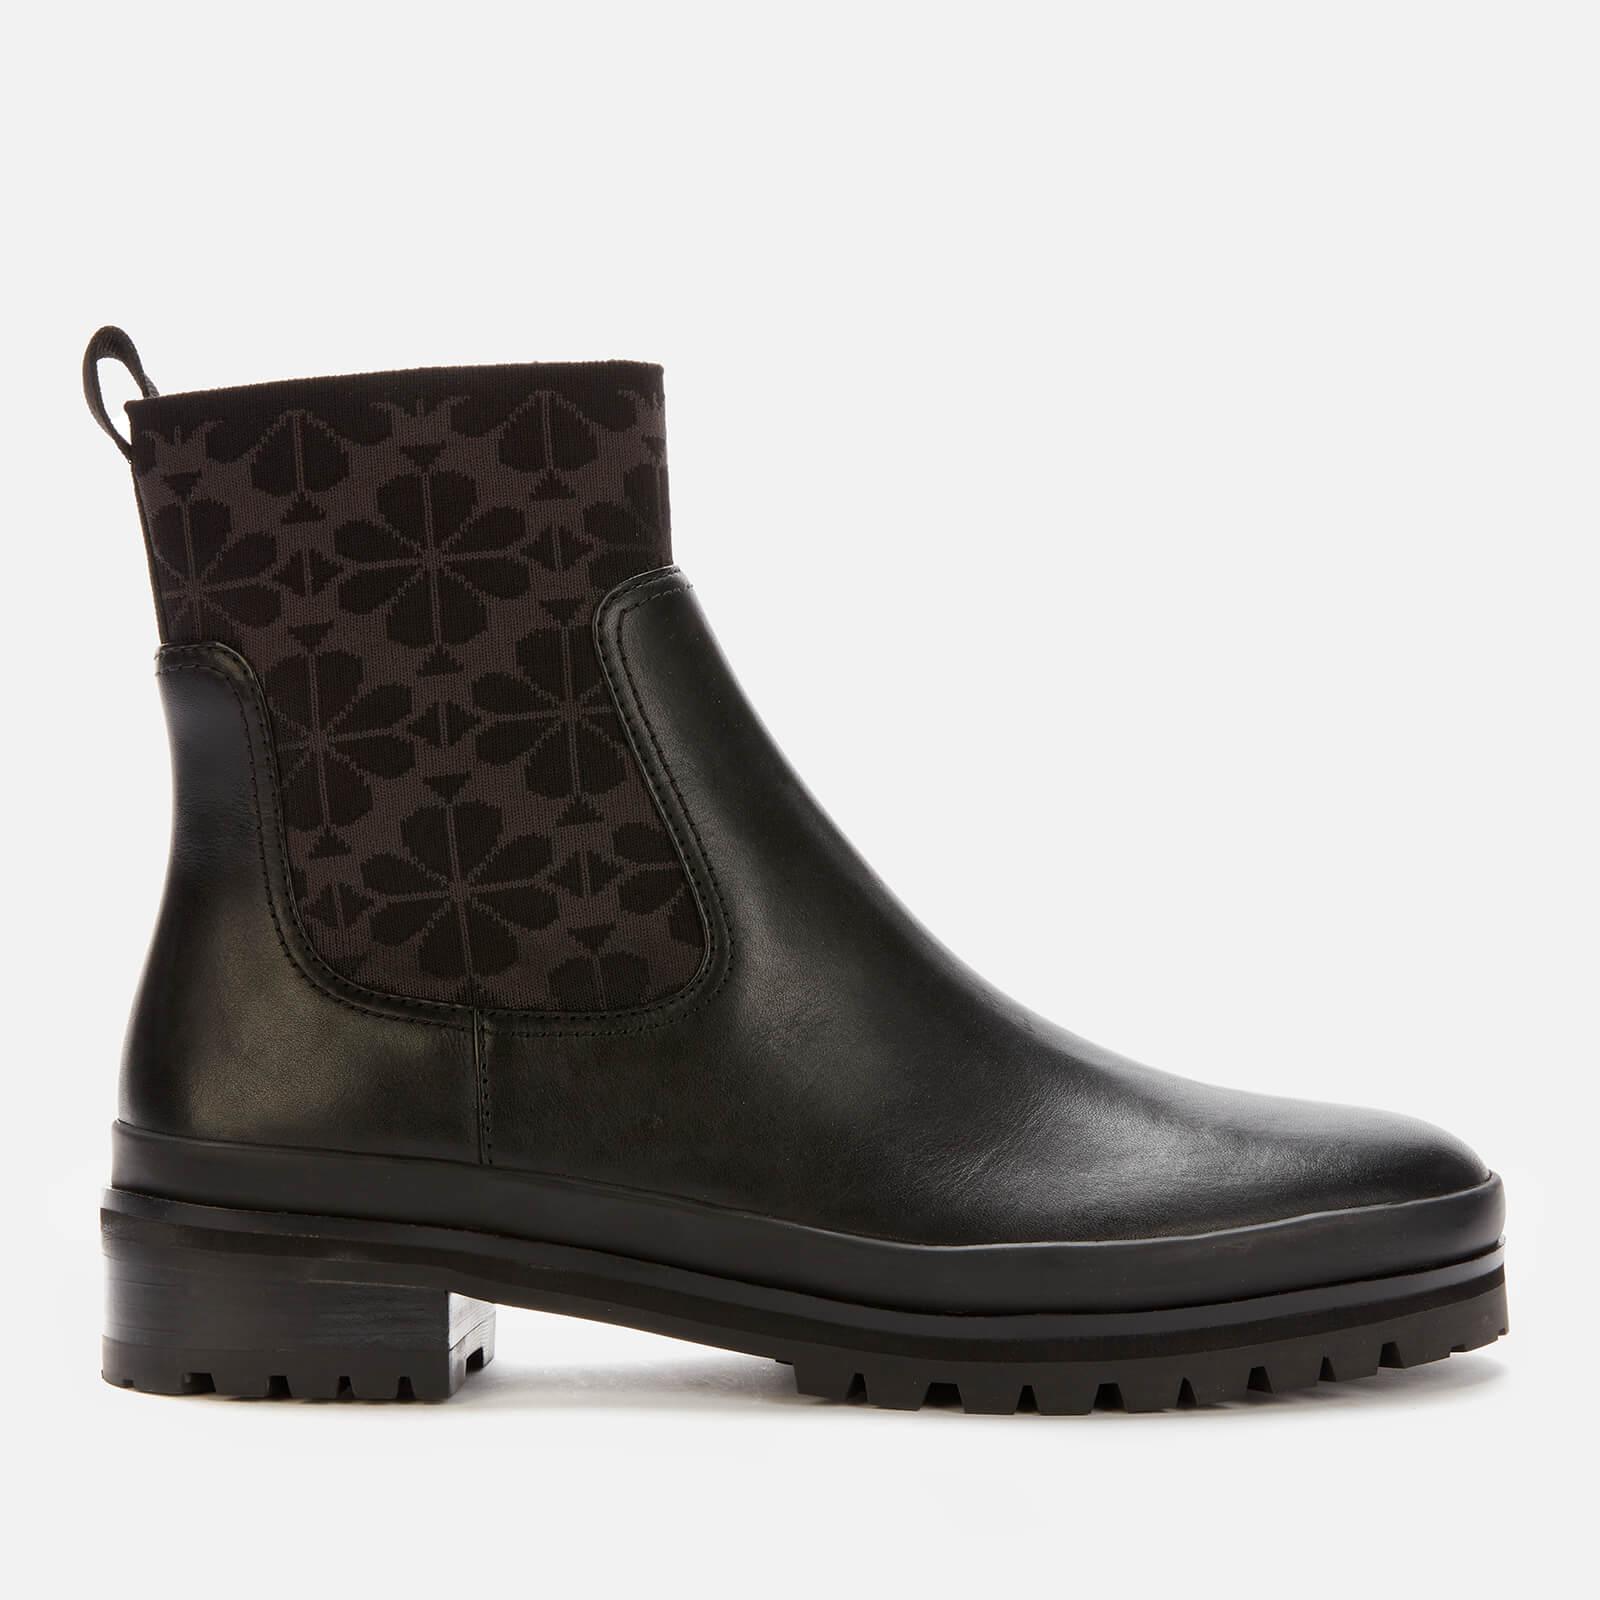 Kate Spade New York Women's Josie Leather Chelsea Boots - Black - UK 7